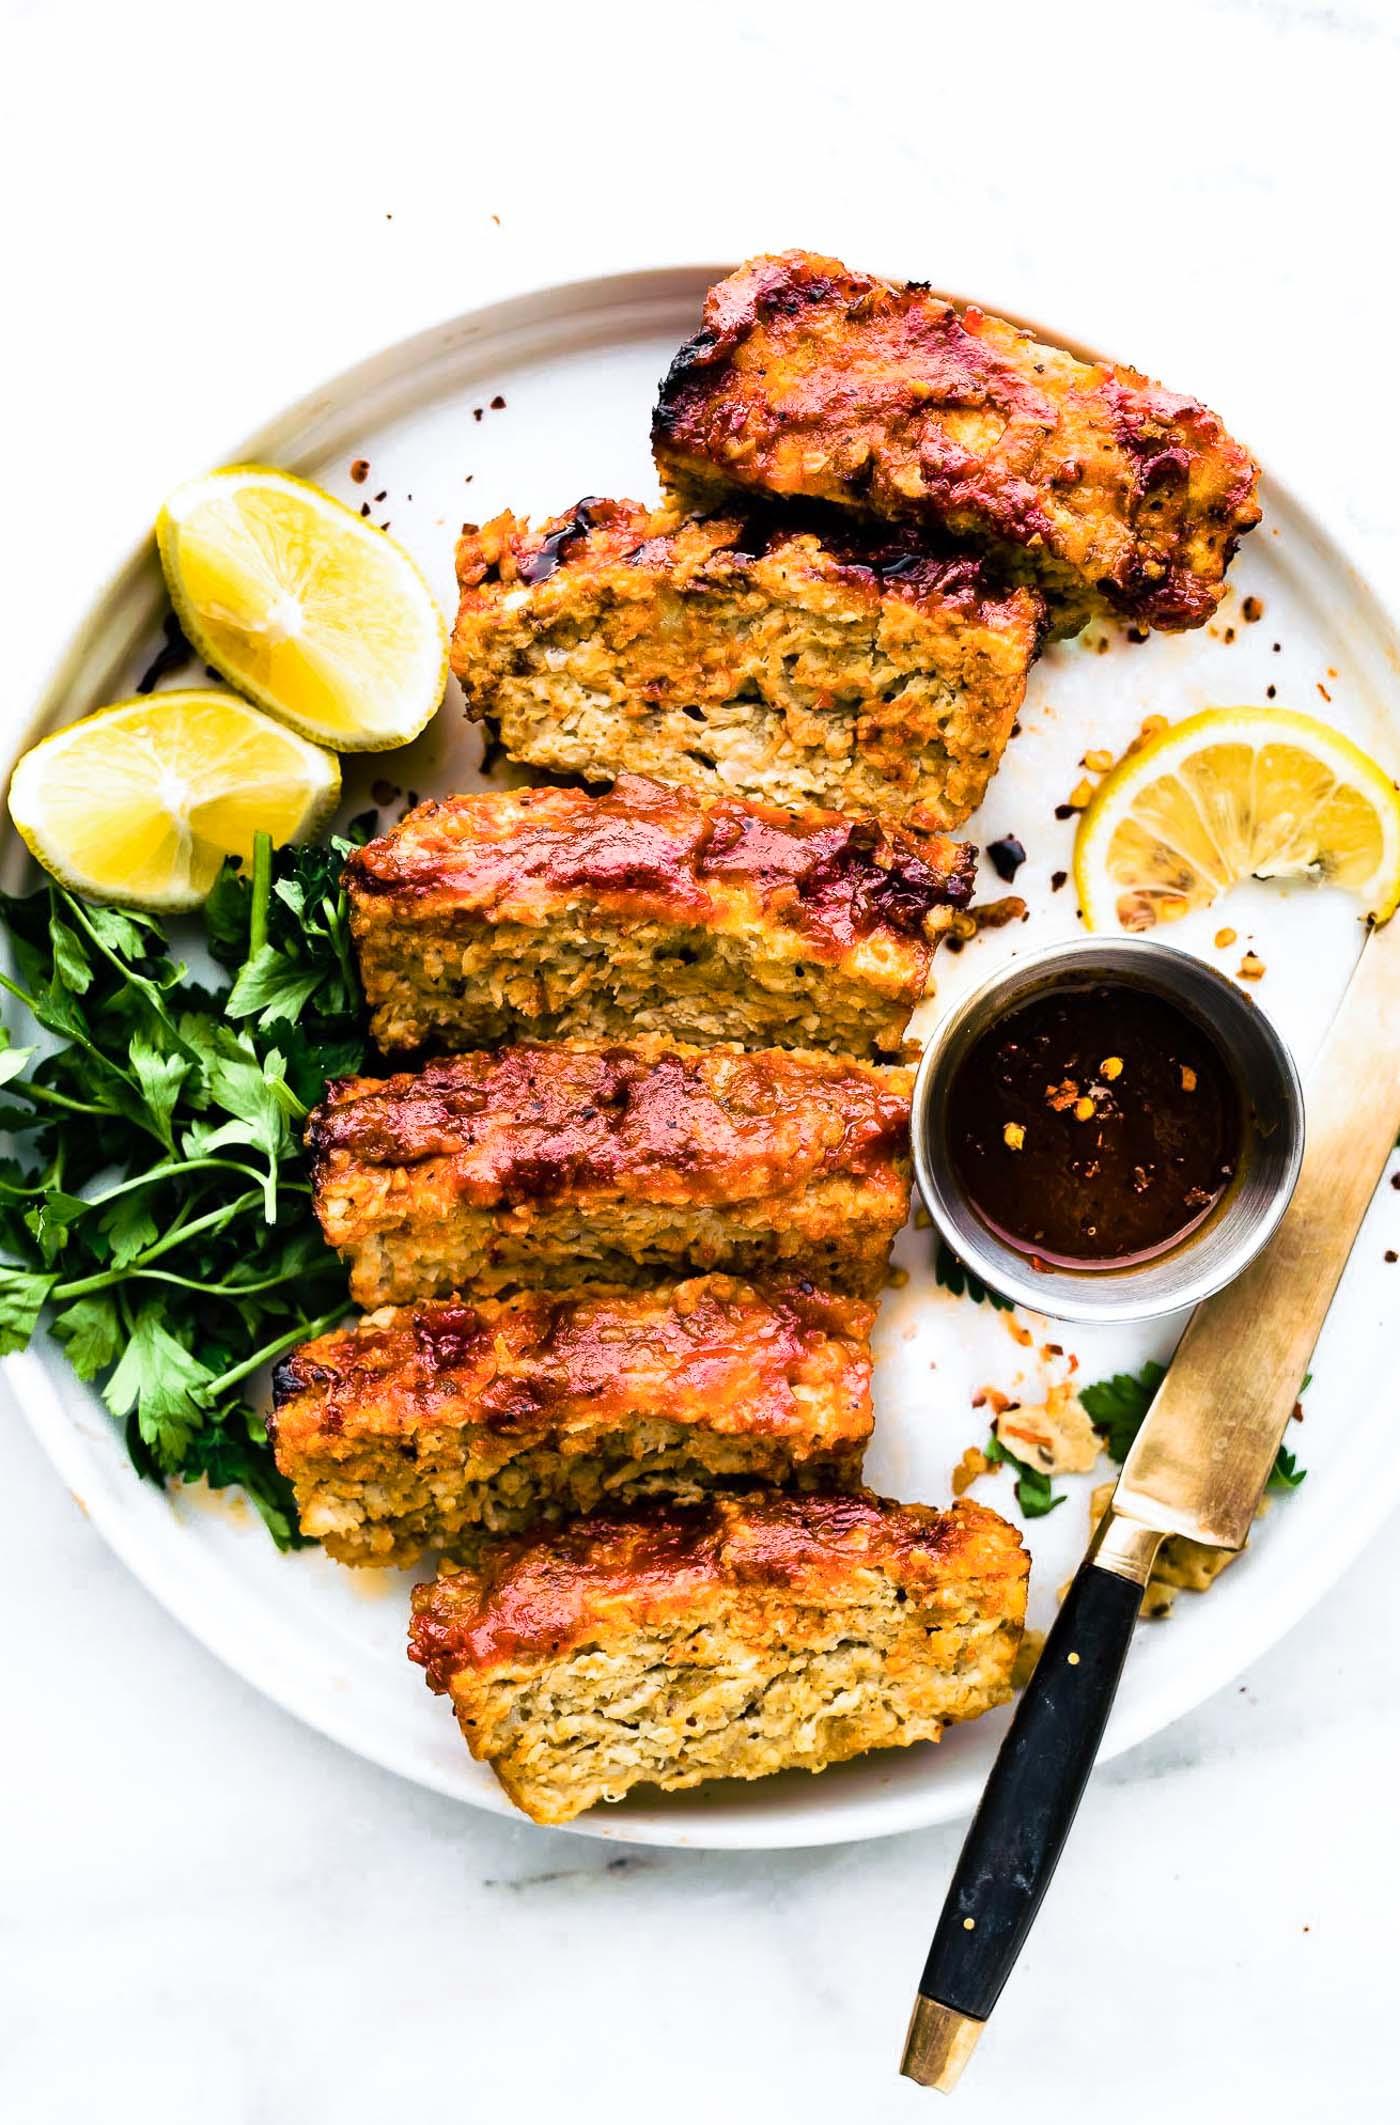 slices of glazedBBQ meatloaf plated